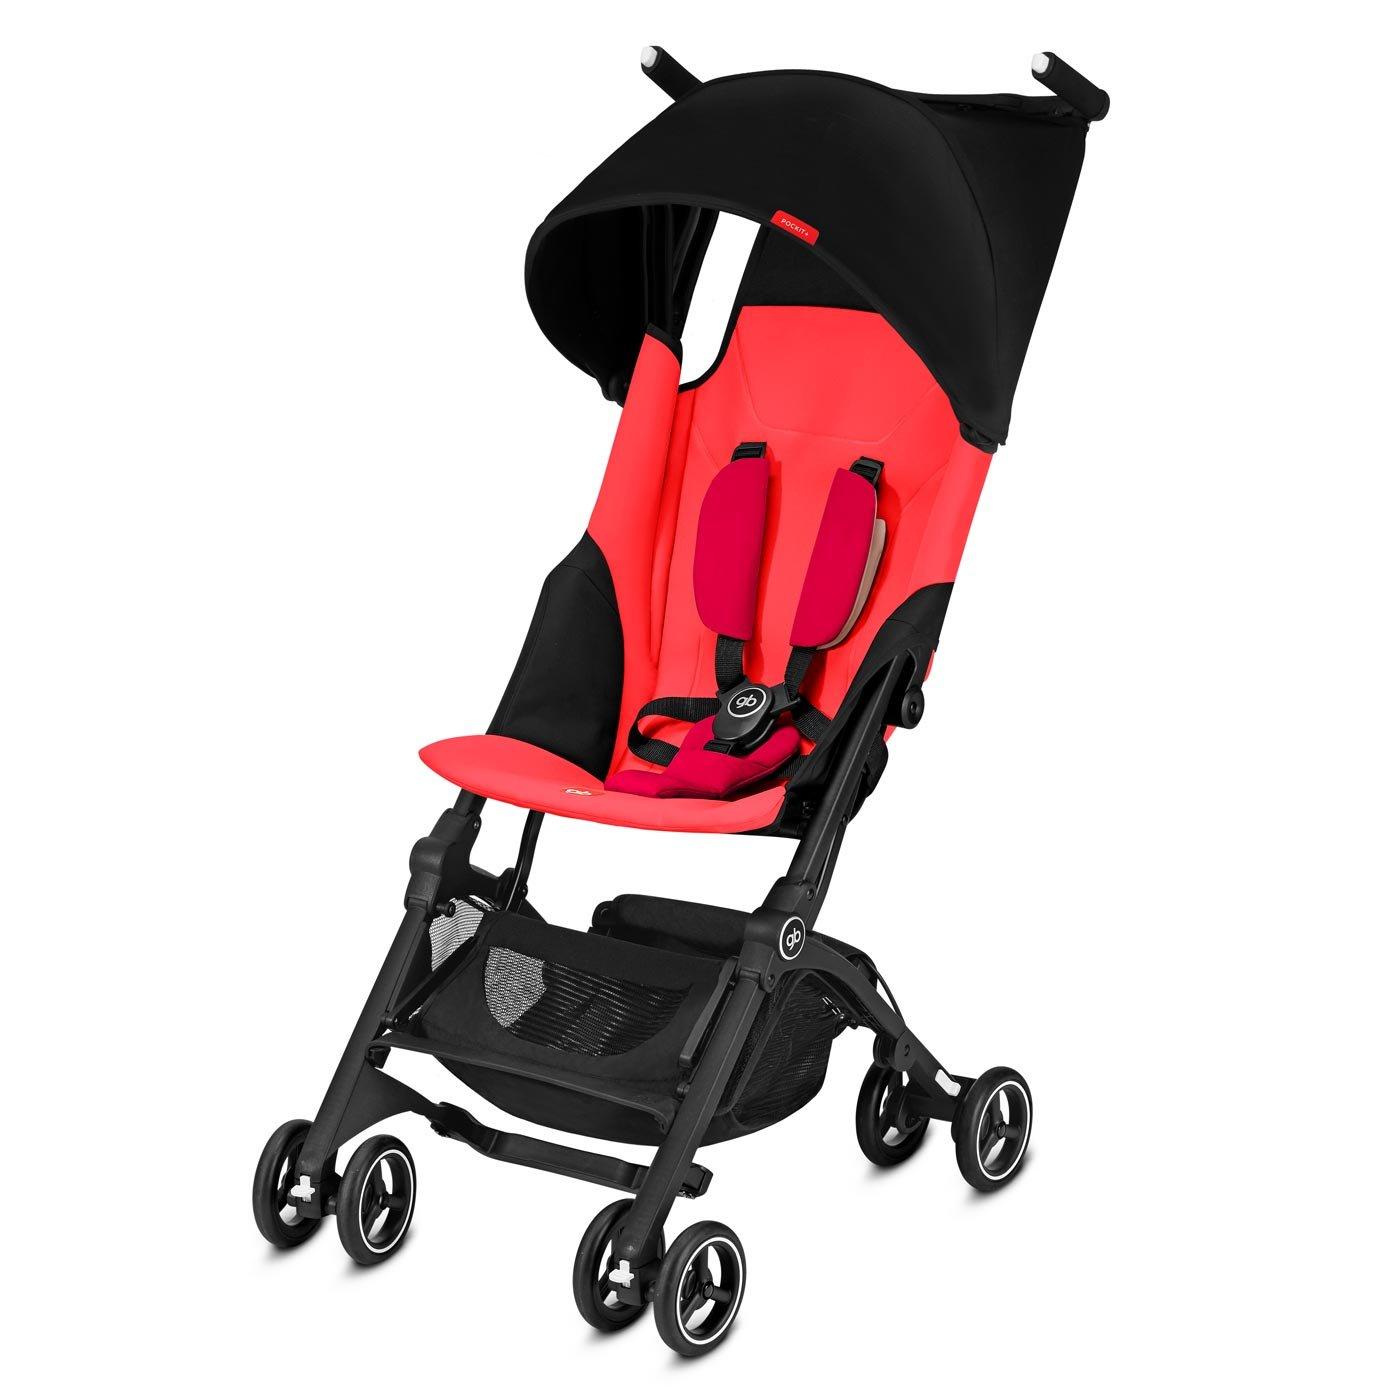 GB Pockit PLUS Stroller 2018 / multi-adjustable backrest / Light Traveler / from 6 Mo.-4Y. Cherry Red